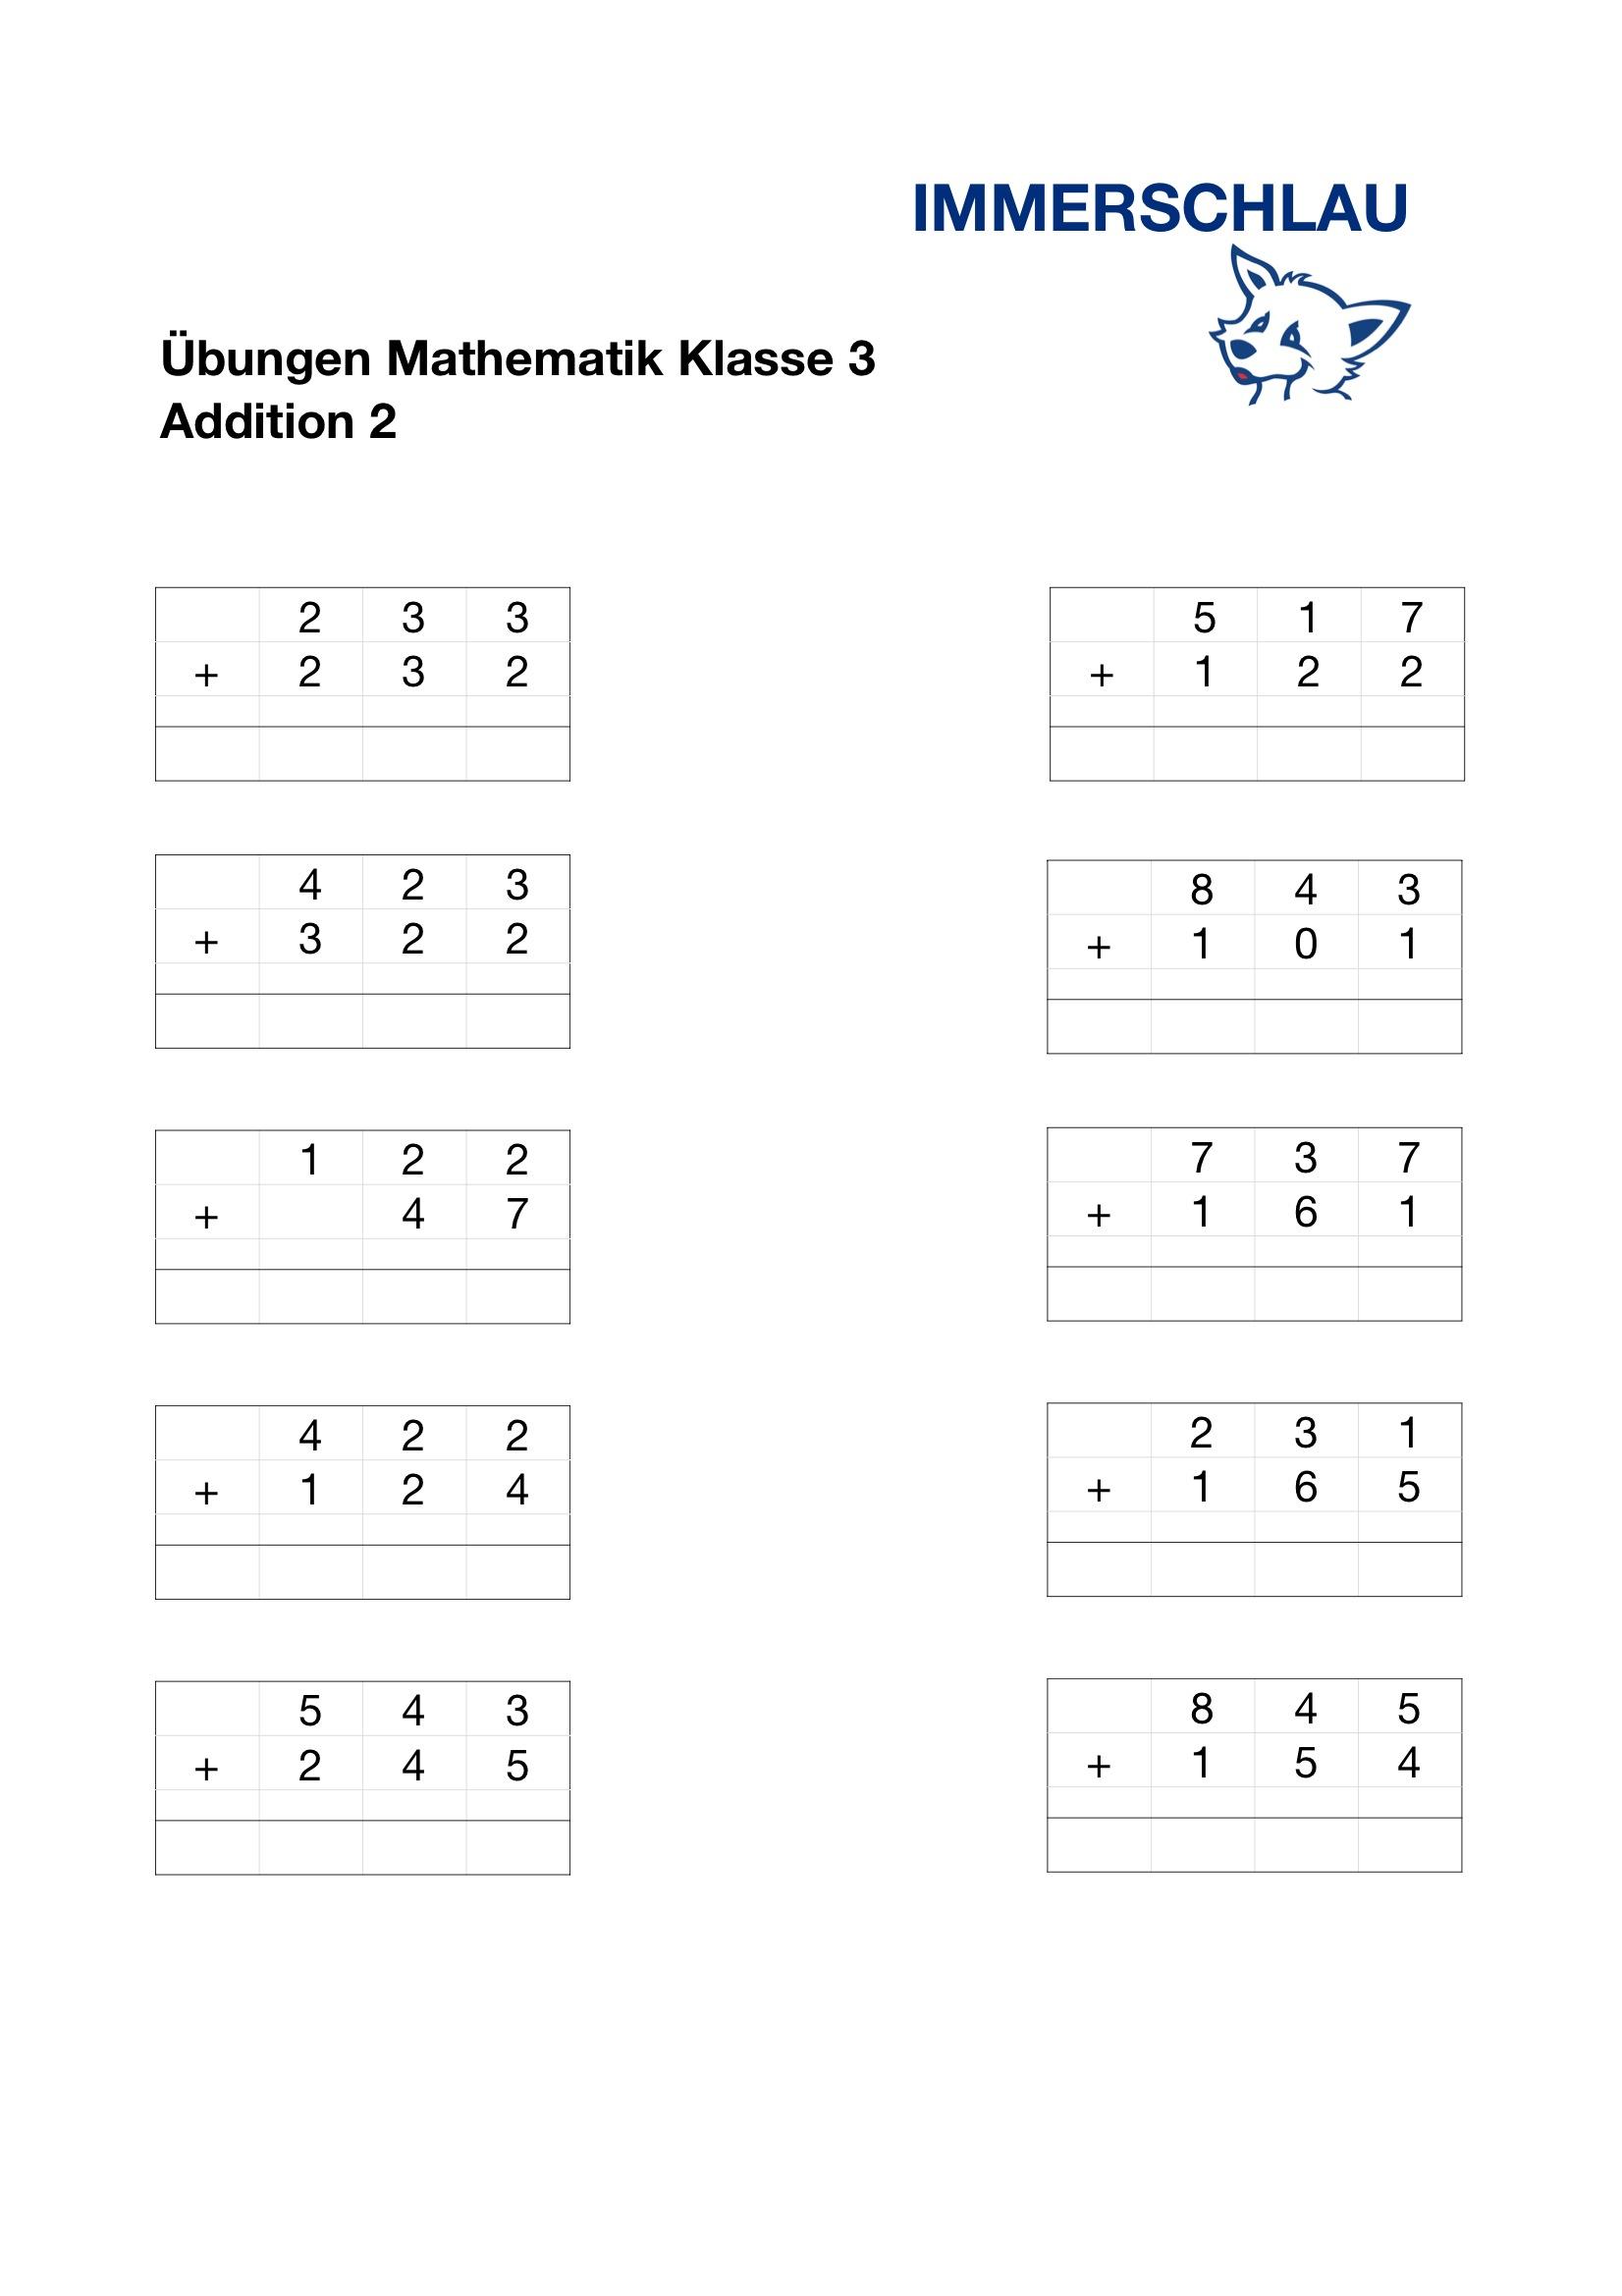 Mathematik Grundschule Arbeitsblätter – Immerschlau bei Mathematik 1 Klasse Hauptschule Arbeitsblätter